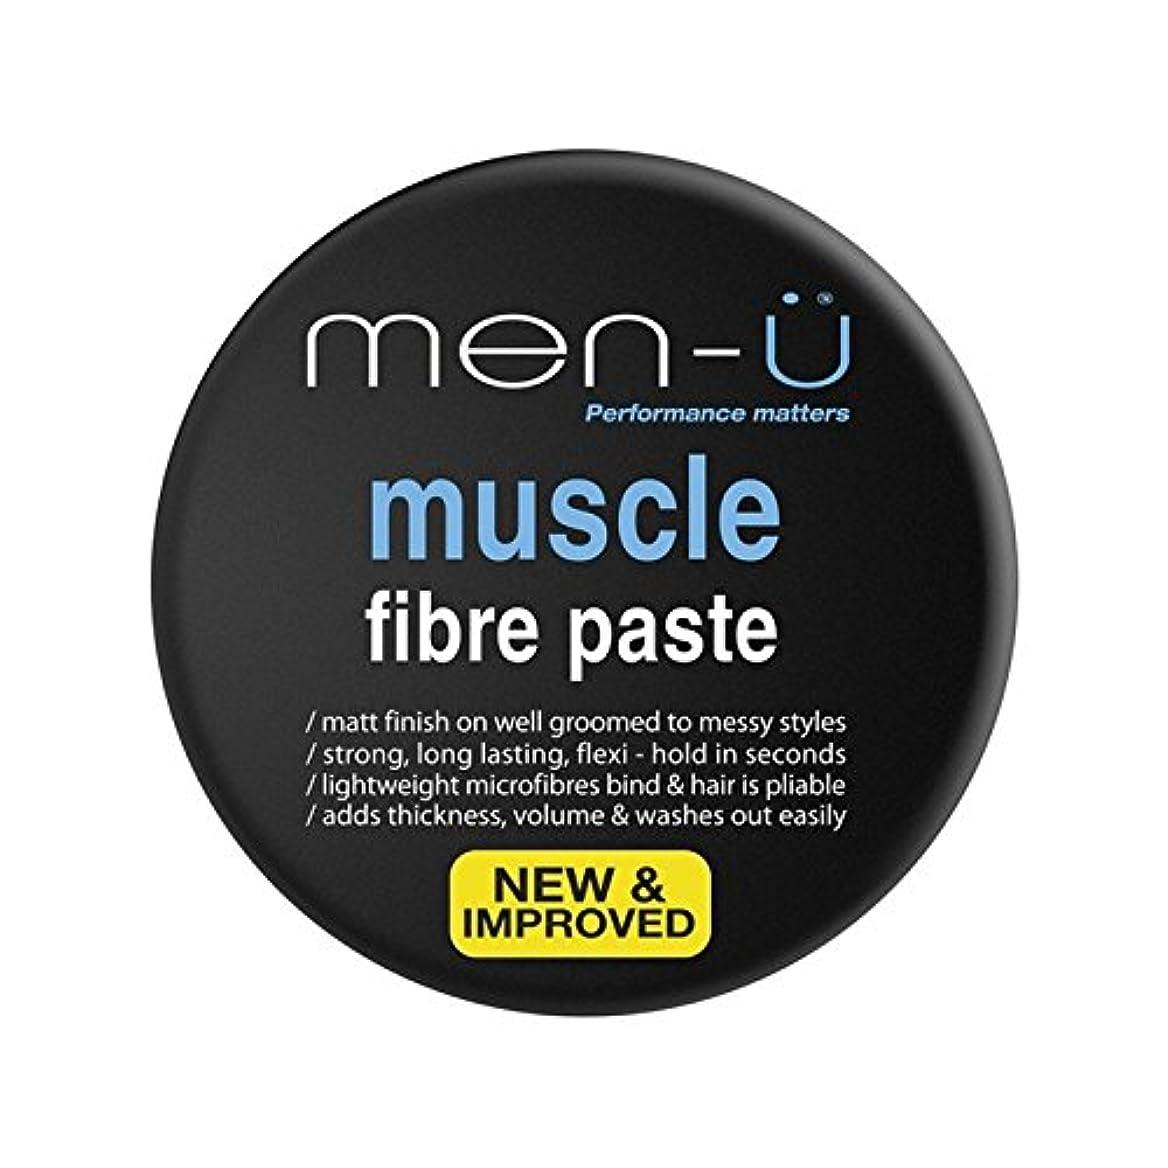 Men-? Muscle Fibre Paste (100ml) - 男性-?筋線維ペースト(100ミリリットル) [並行輸入品]